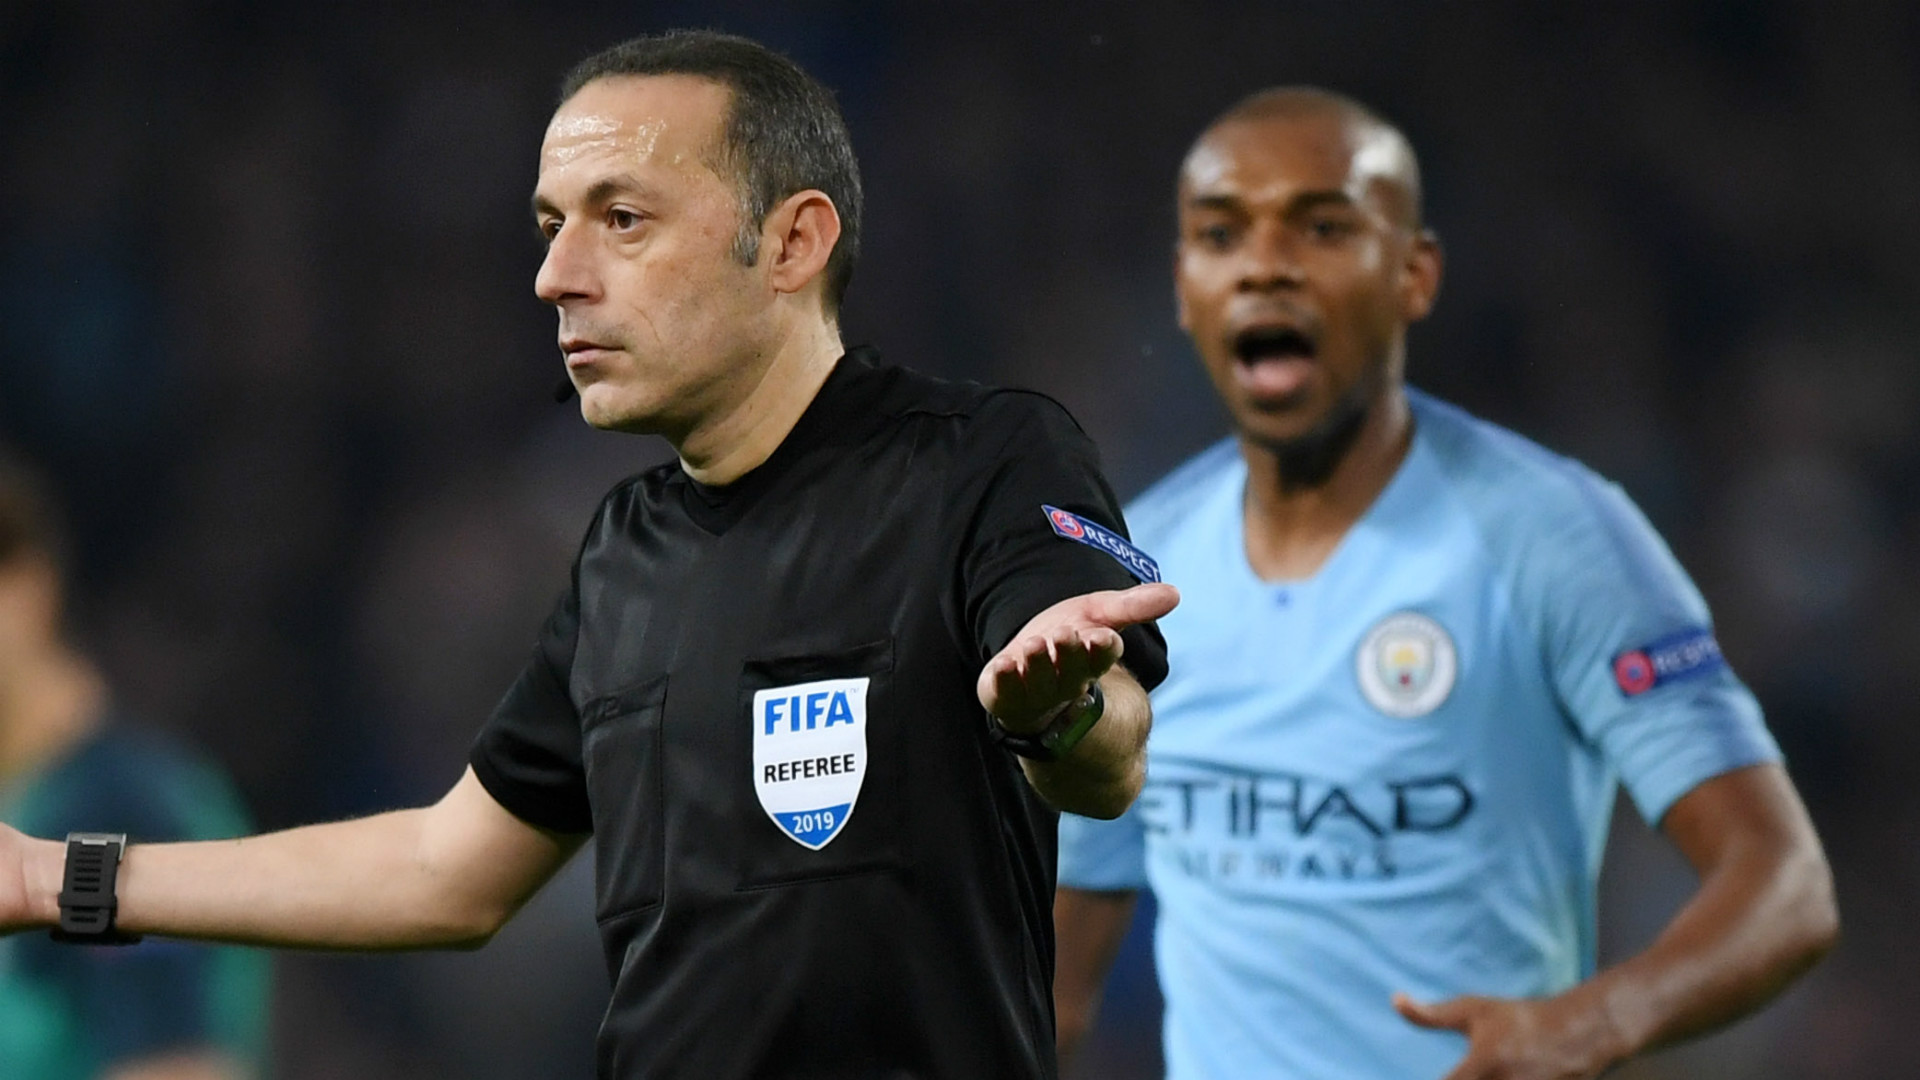 Man City 4 3 Tottenham Var Has Ruined Everything Spurs Stun City In Champions League Epic Goal Com